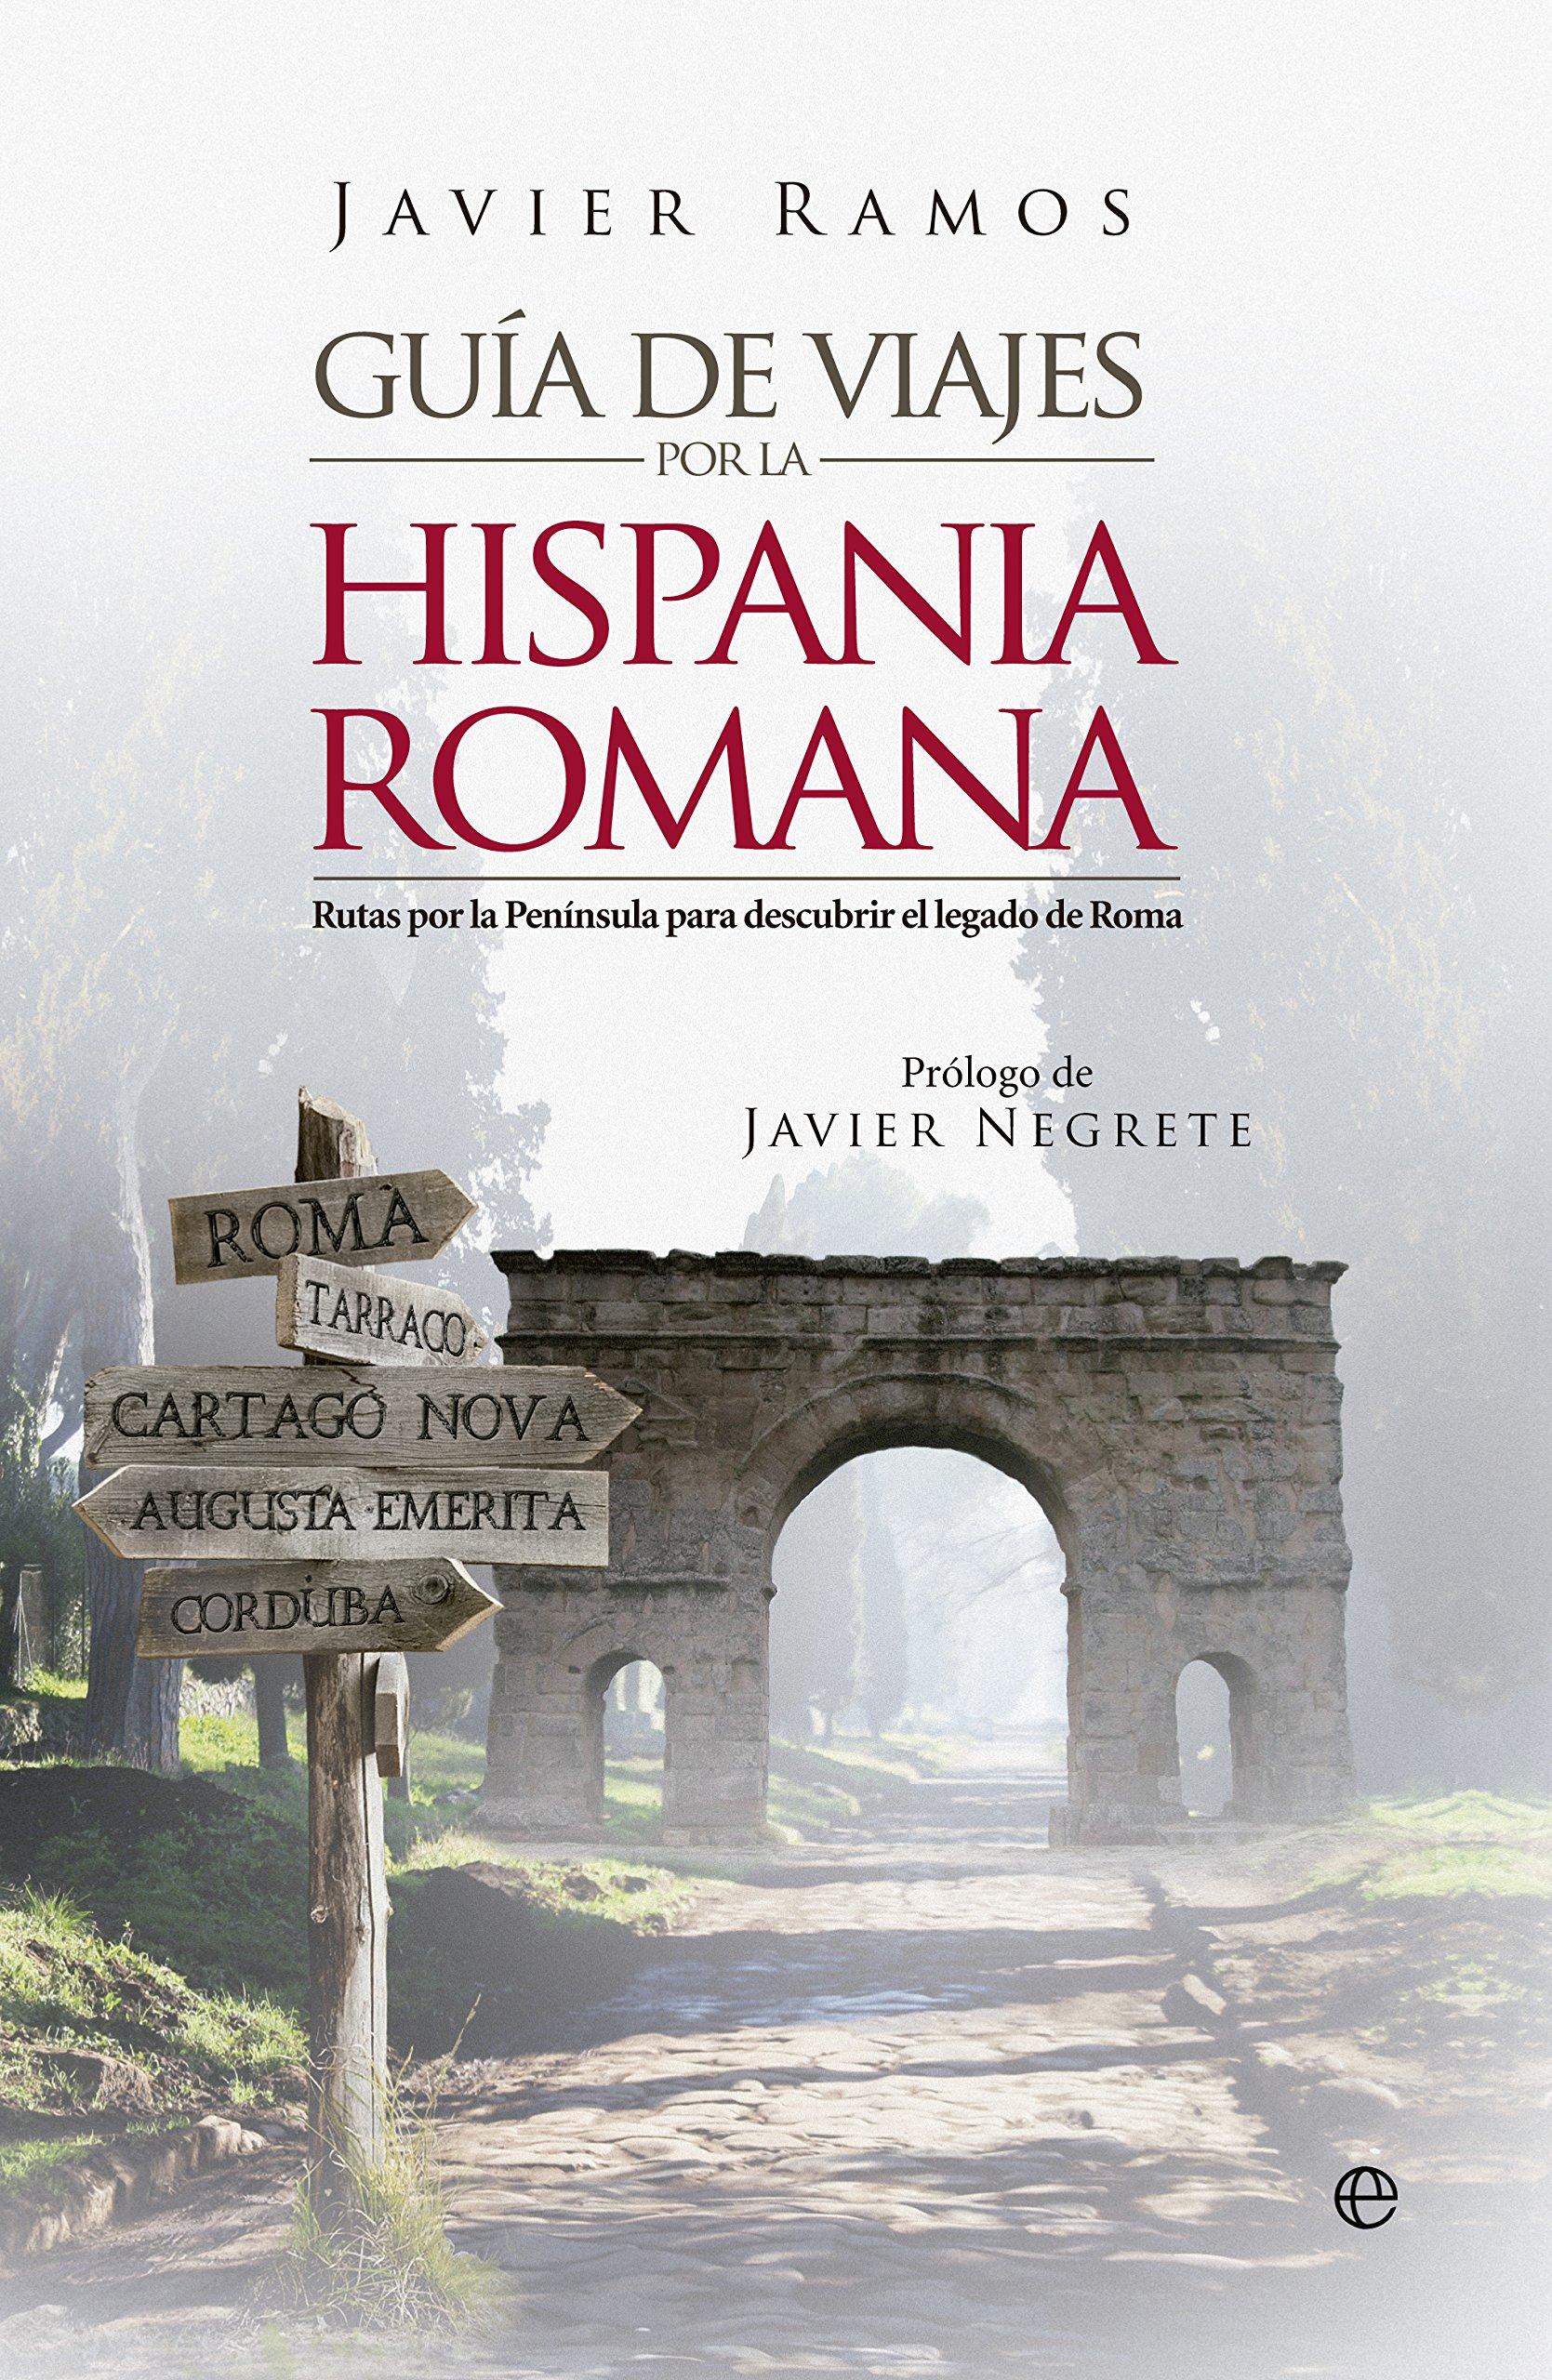 Guía De Viaje Por La Hispania Romana (Historia): Amazon.es: Ramos de los Santos, Javier, Negrete Medina, Javier: Libros